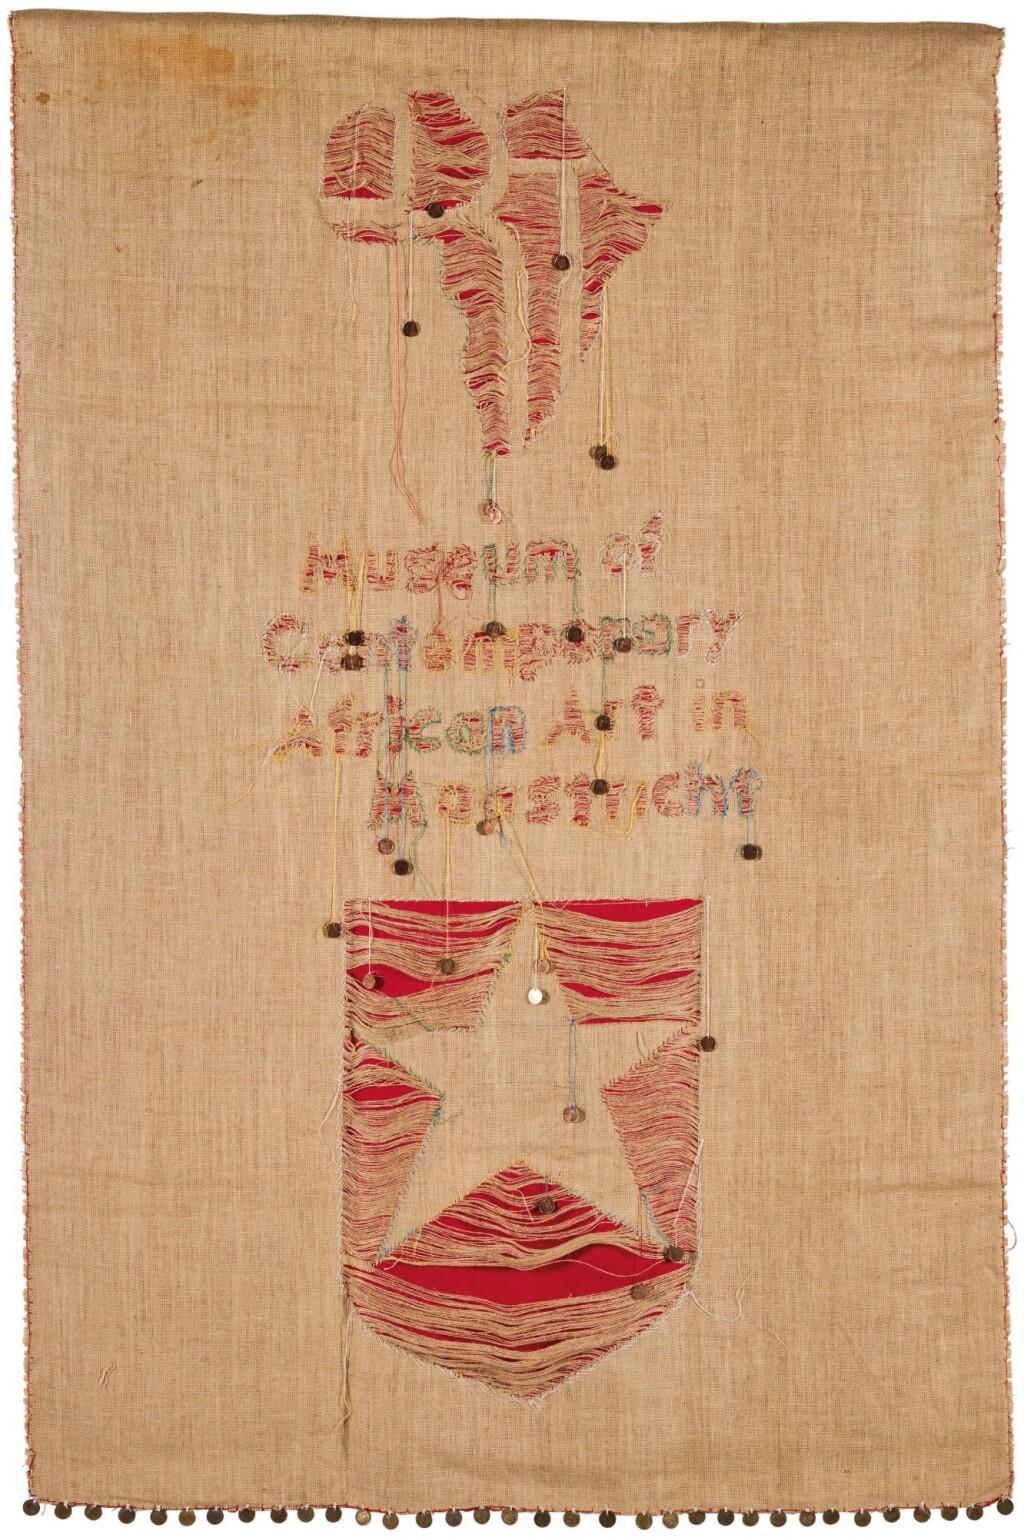 MESCHAC GABA | CONTINENTAL SHIFT. A VOYAGE BETWEEN CULTURES: LE DISCOTHÈQUE DU MUSÉE